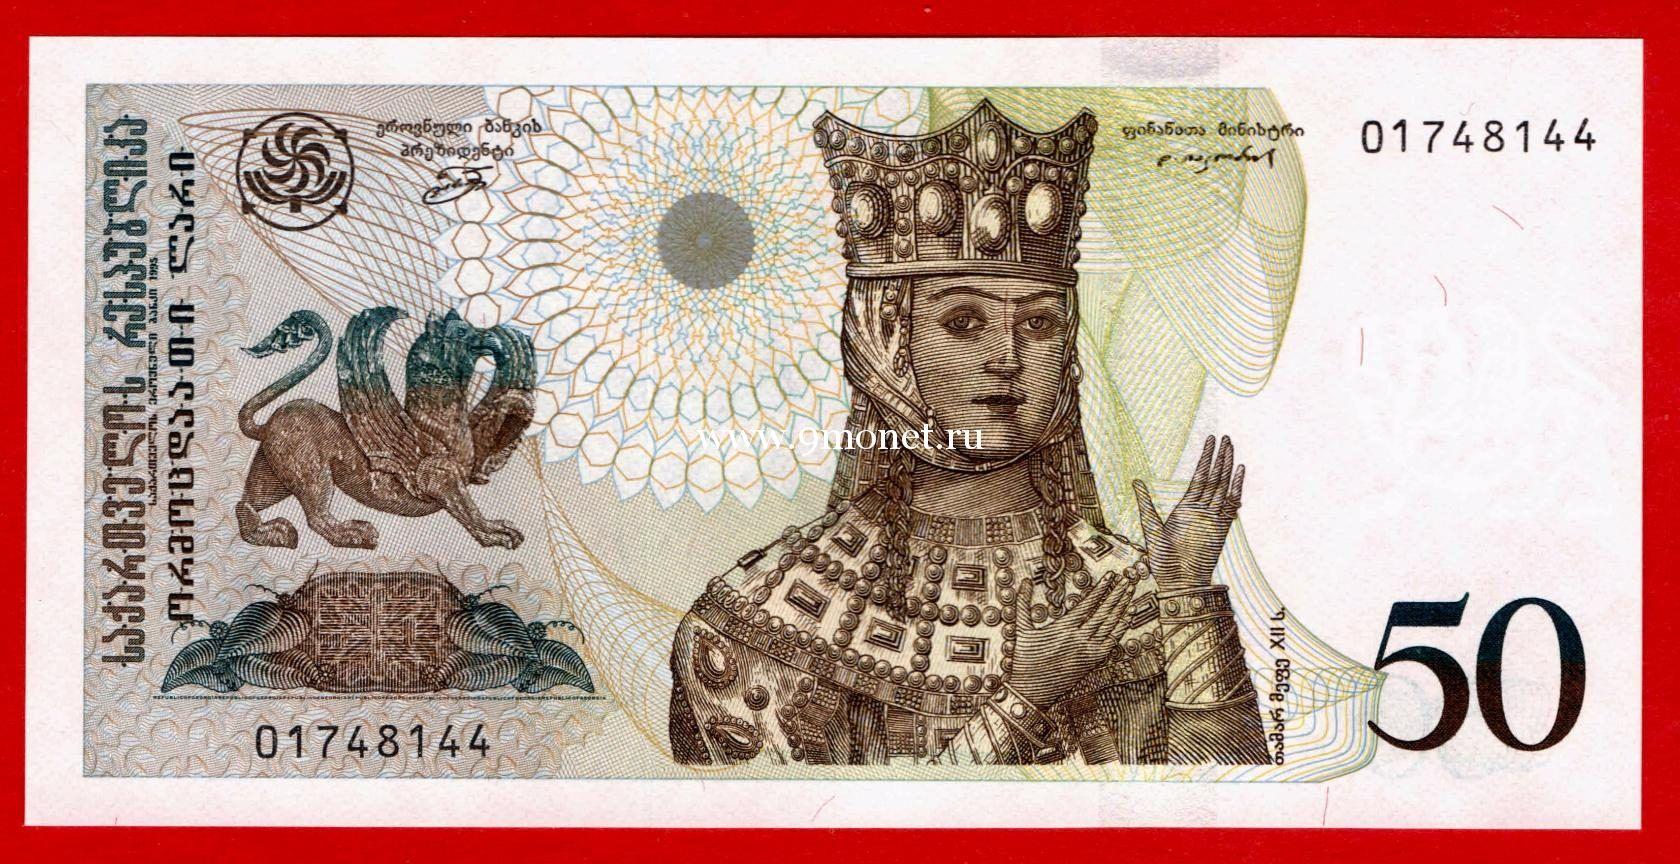 1995 год. Грузия. Банкнота 50 лари. UN